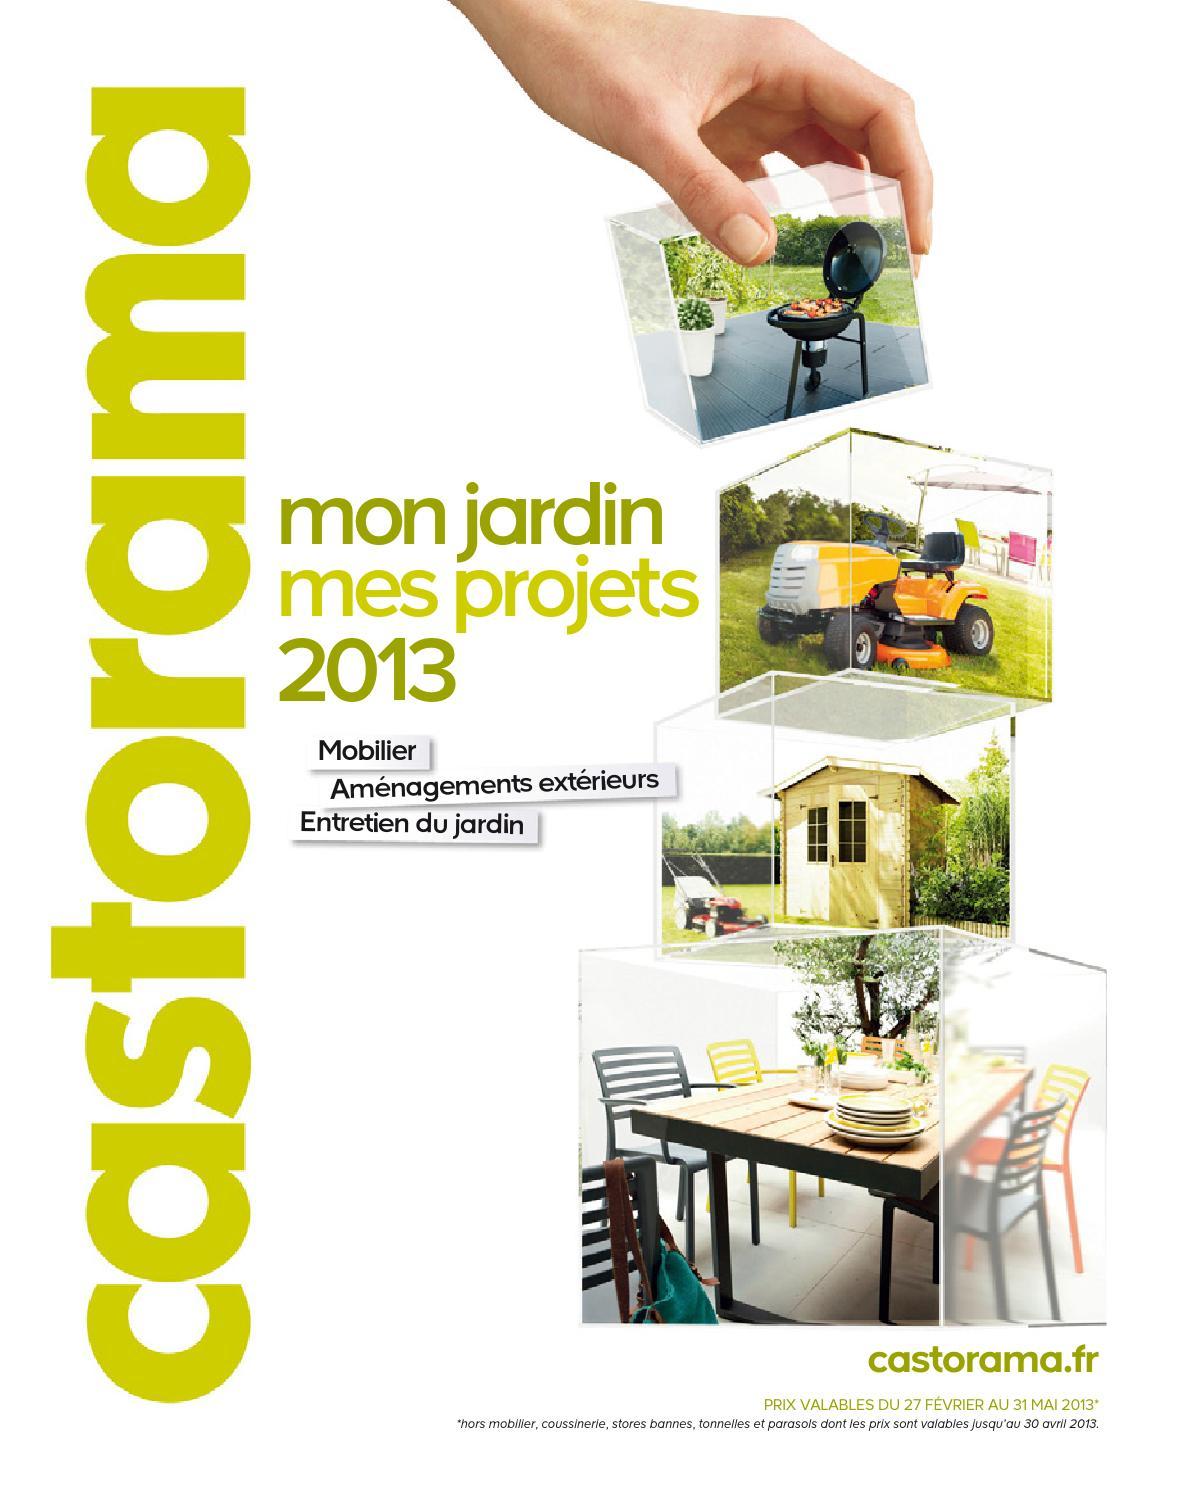 Catalogue Castorama Jardin Projets By Margot Ziegler - Issuu concernant Epdm Castorama